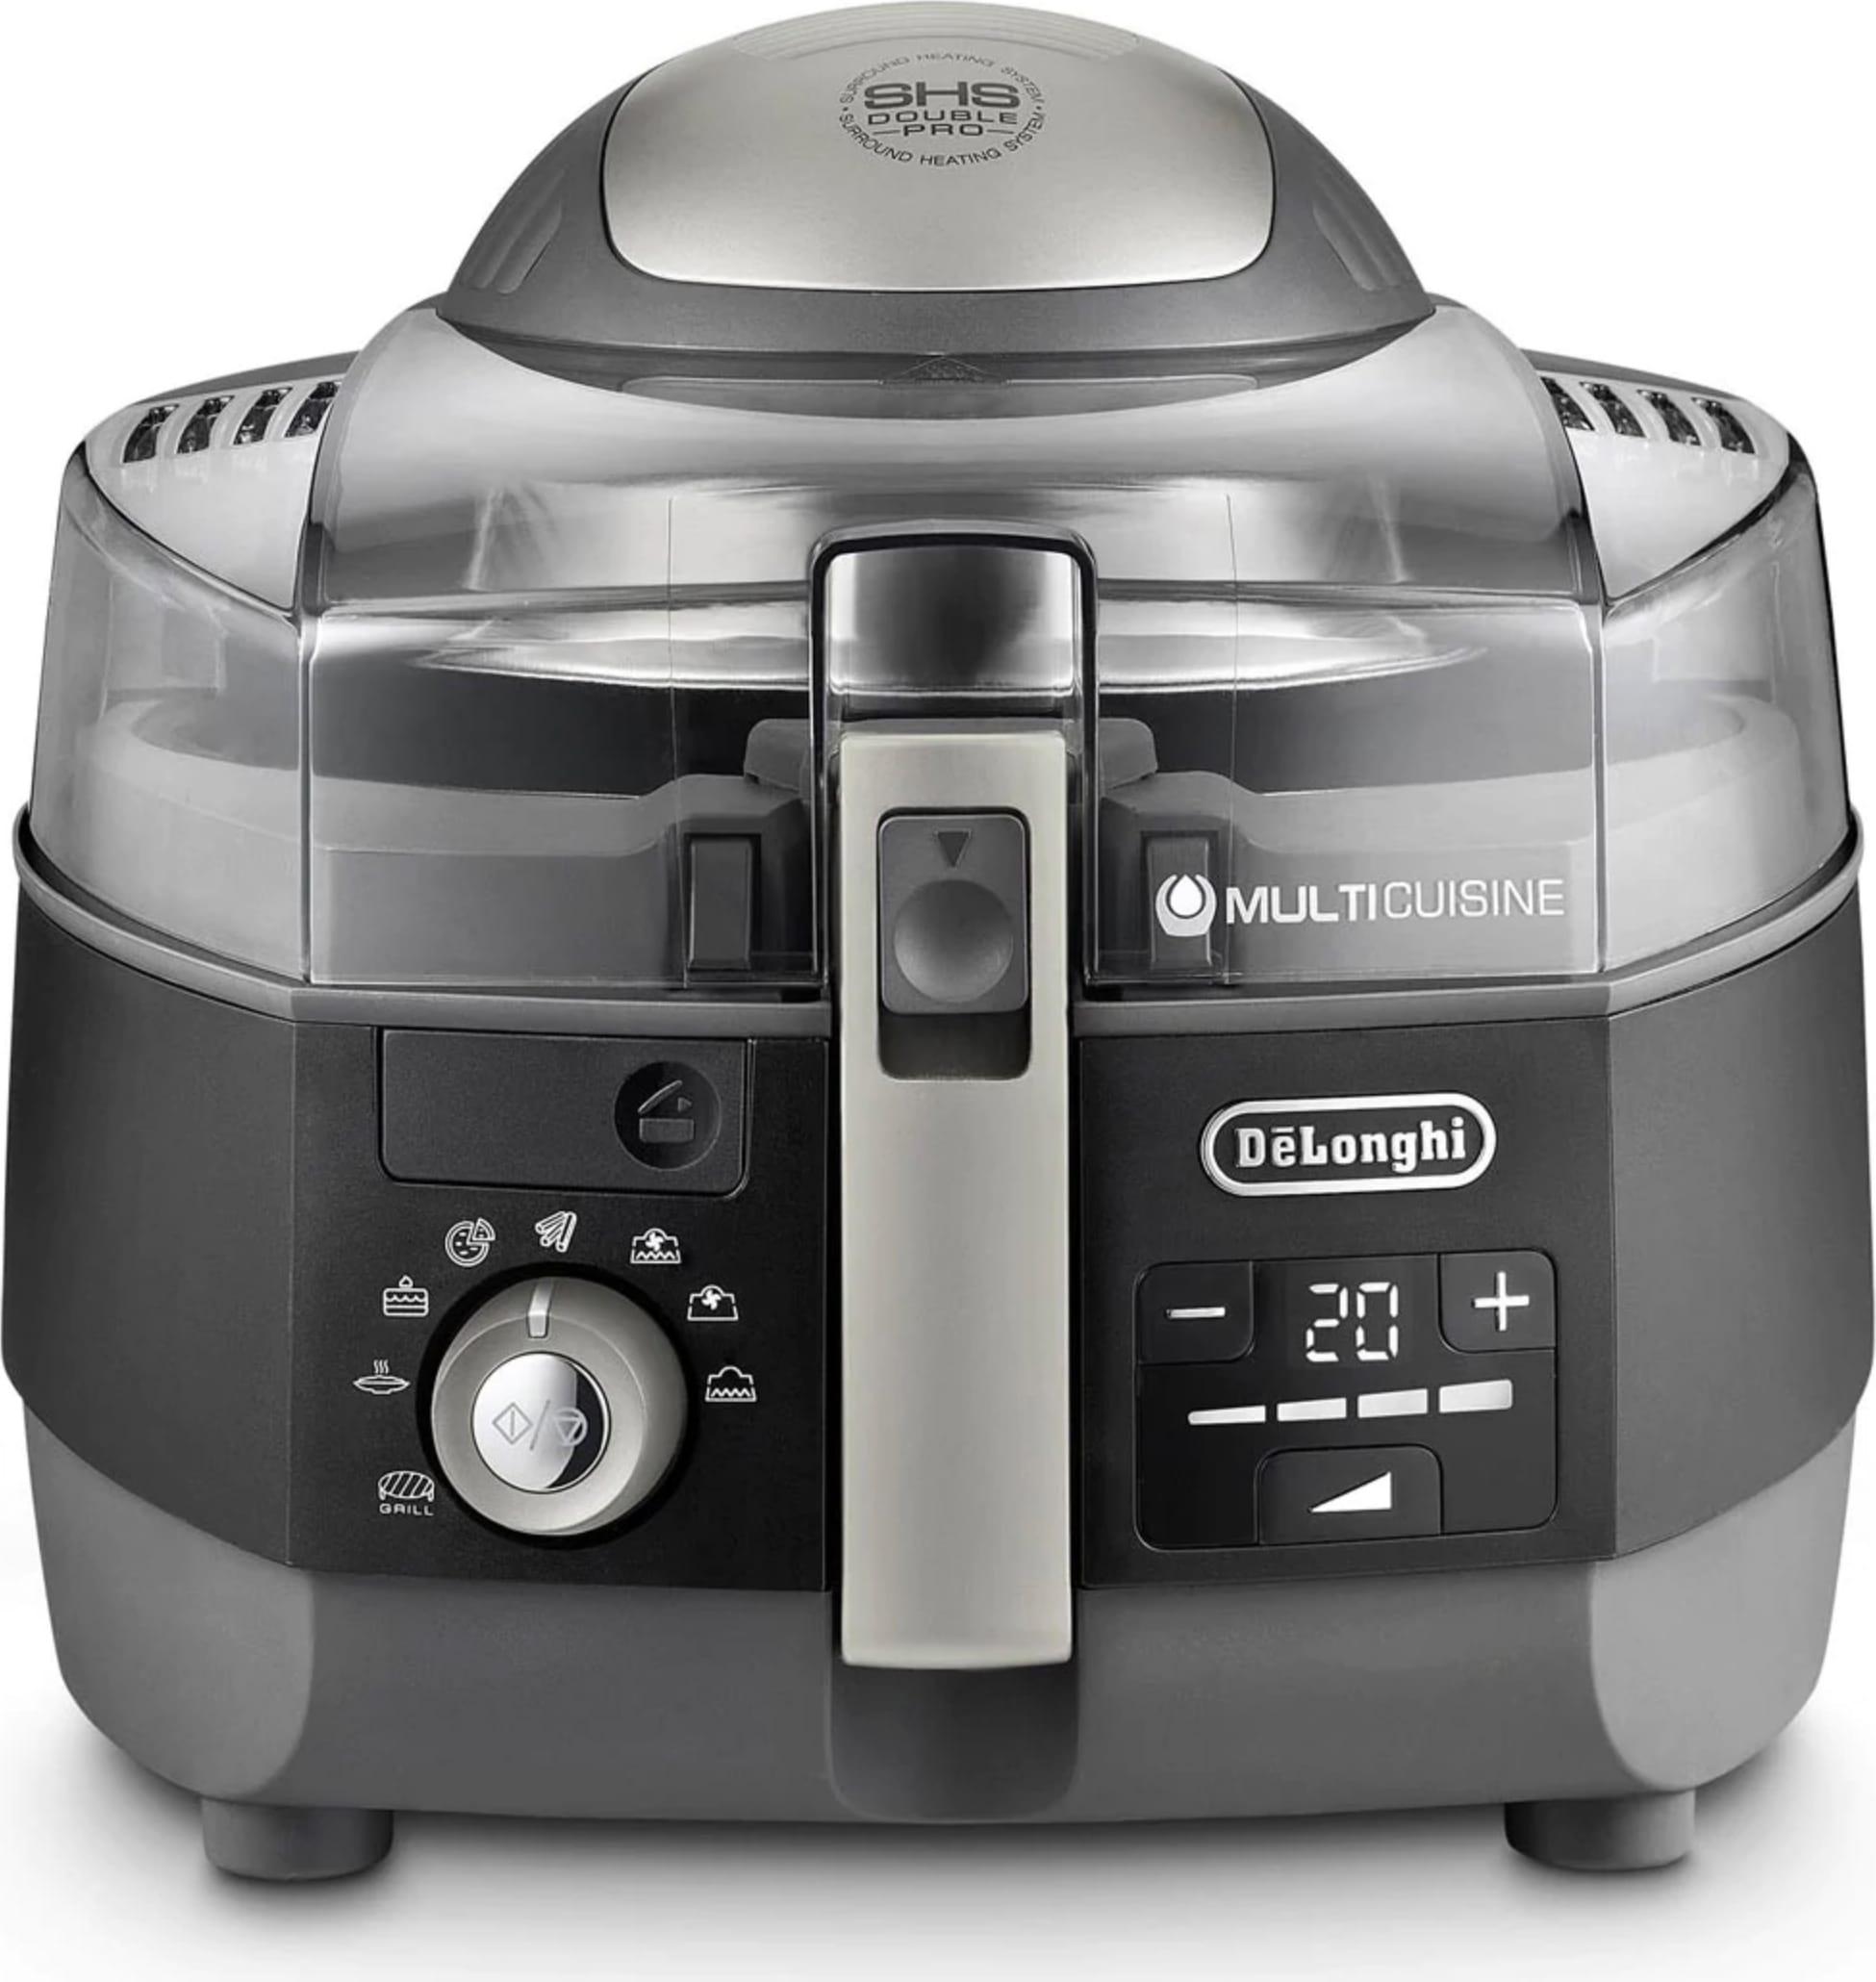 De longhi robot da cucina multicooker pentola elettrica friggitrice 1 7lt fh1396 - Cucina elettrica de longhi ...